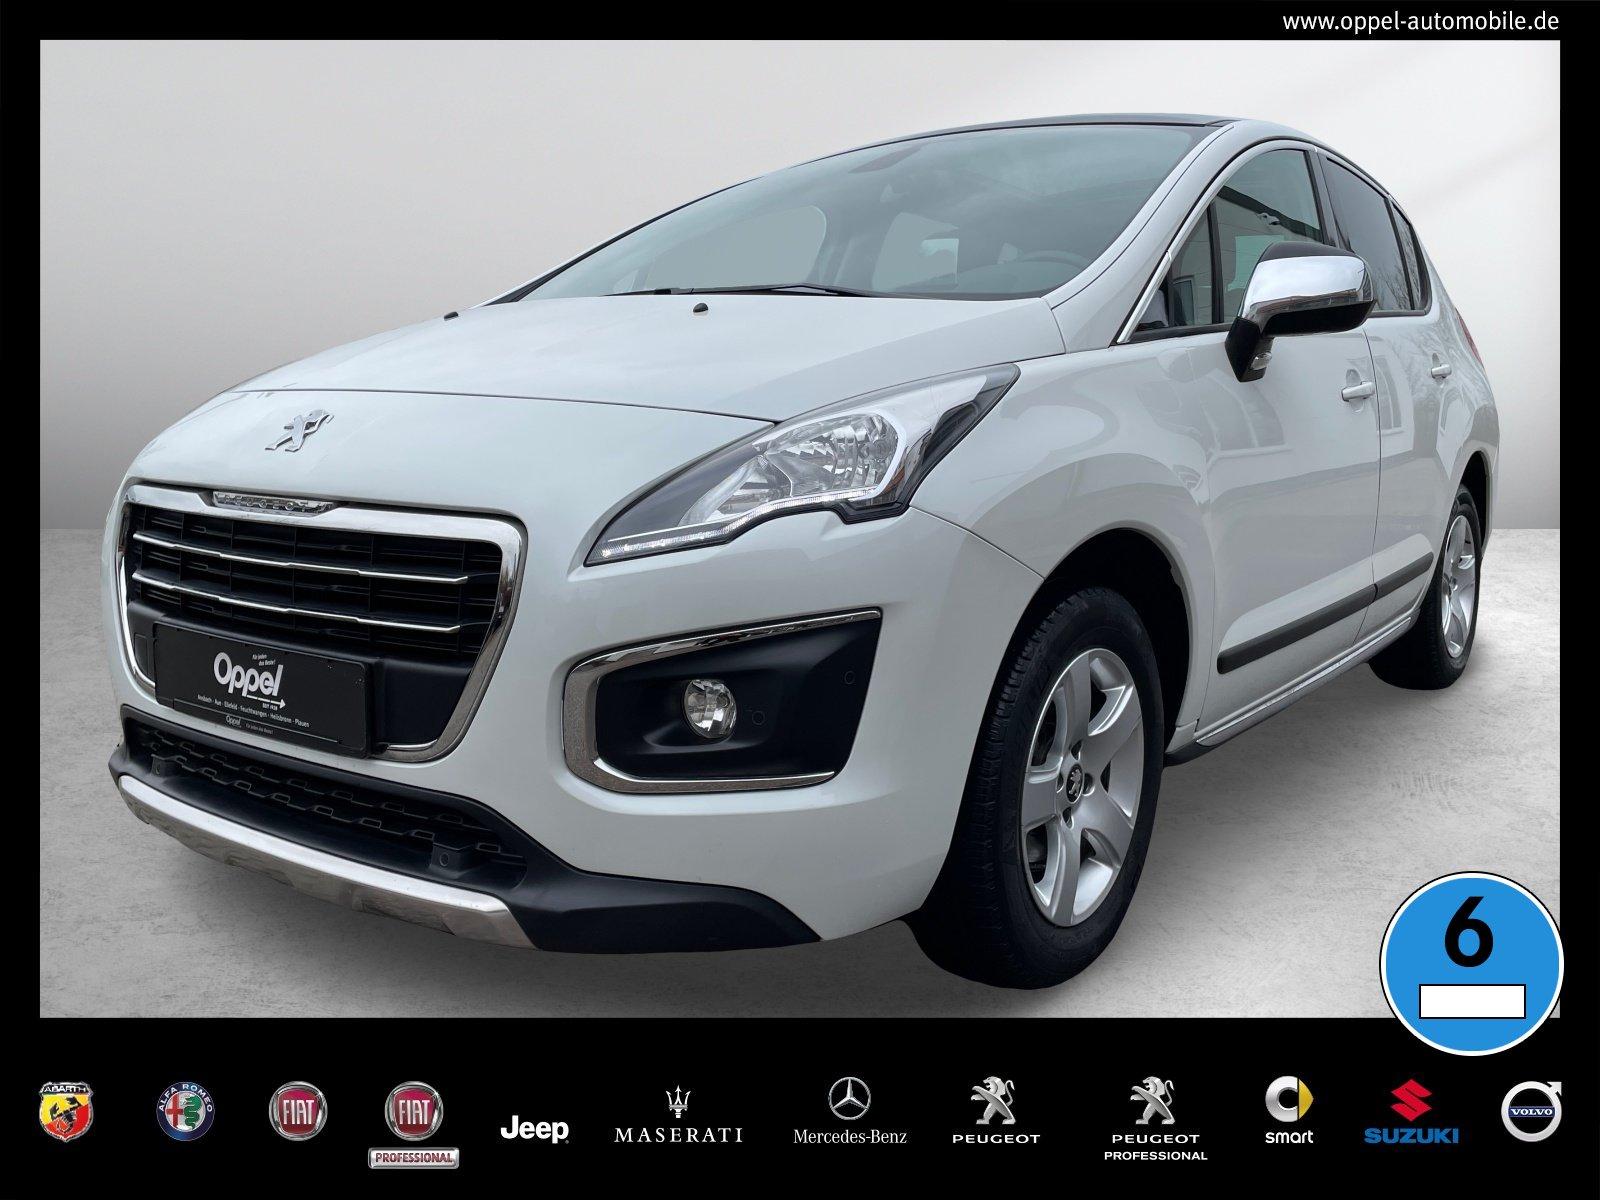 Peugeot 3008 Allure 1.6 120 NAVI+SITZH.+PANO+TEMPO+BT BC, Jahr 2015, Diesel